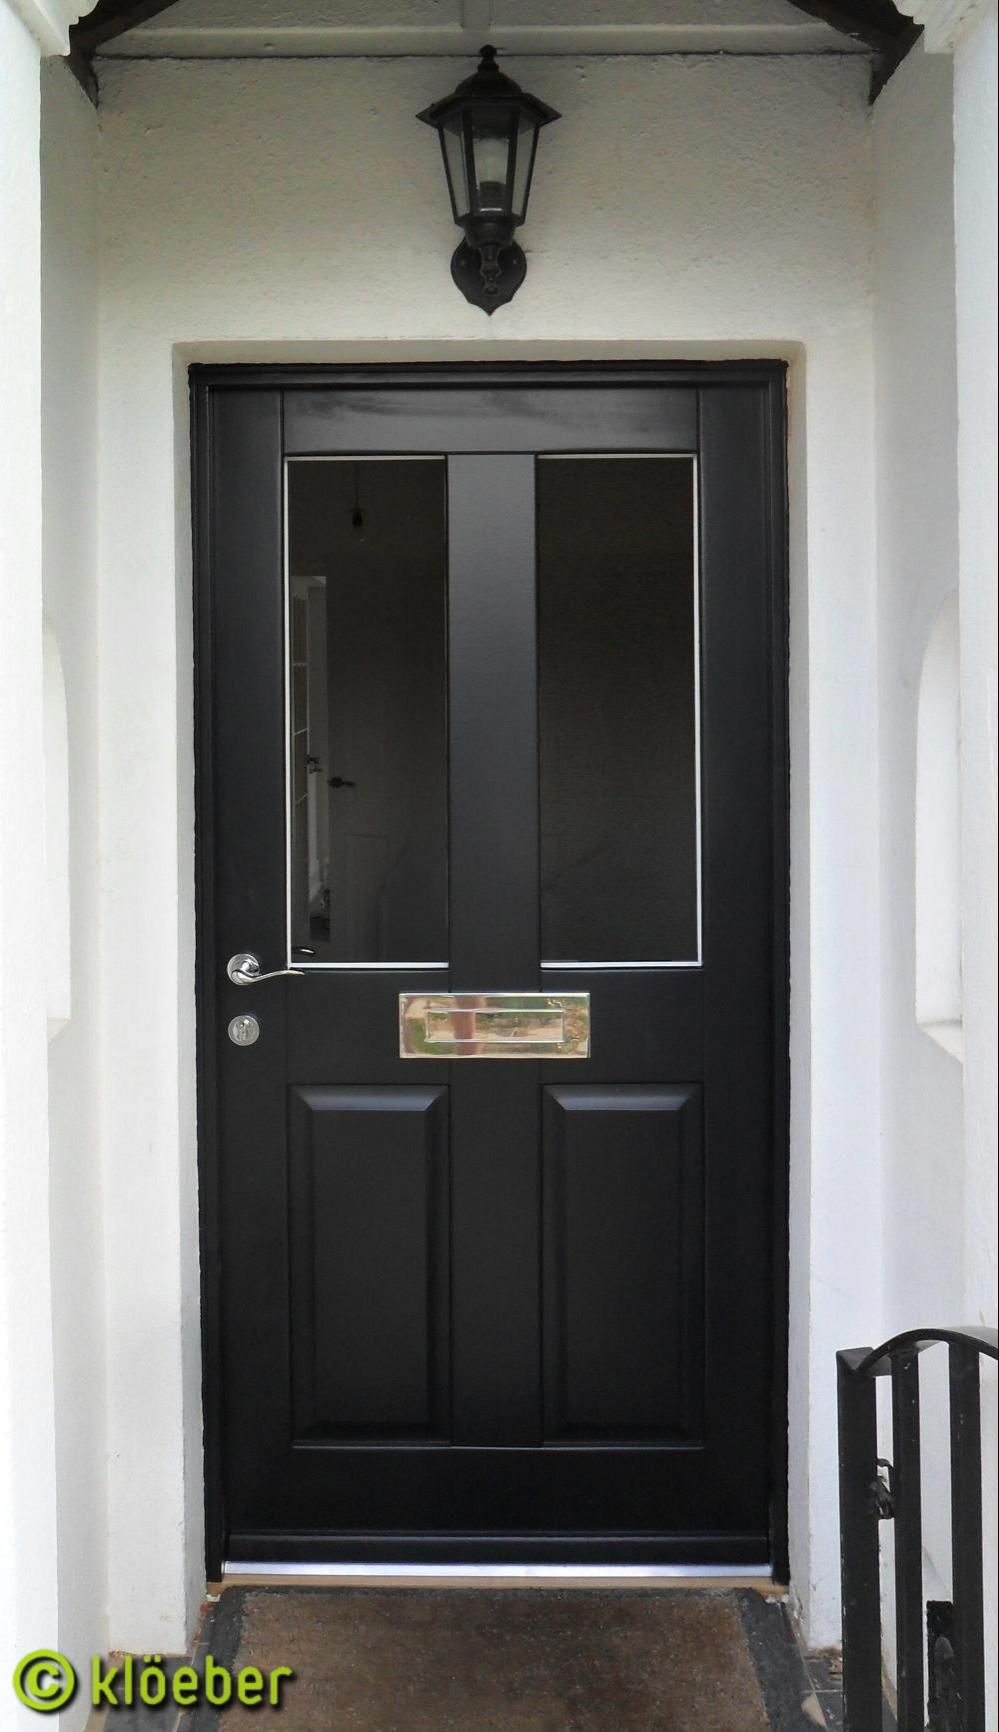 Kloeber gallery klassicfront traditional style doors entry kloeber gallery klassicfront traditional style doors traditional stylesfront doorscurb appealentrance rubansaba